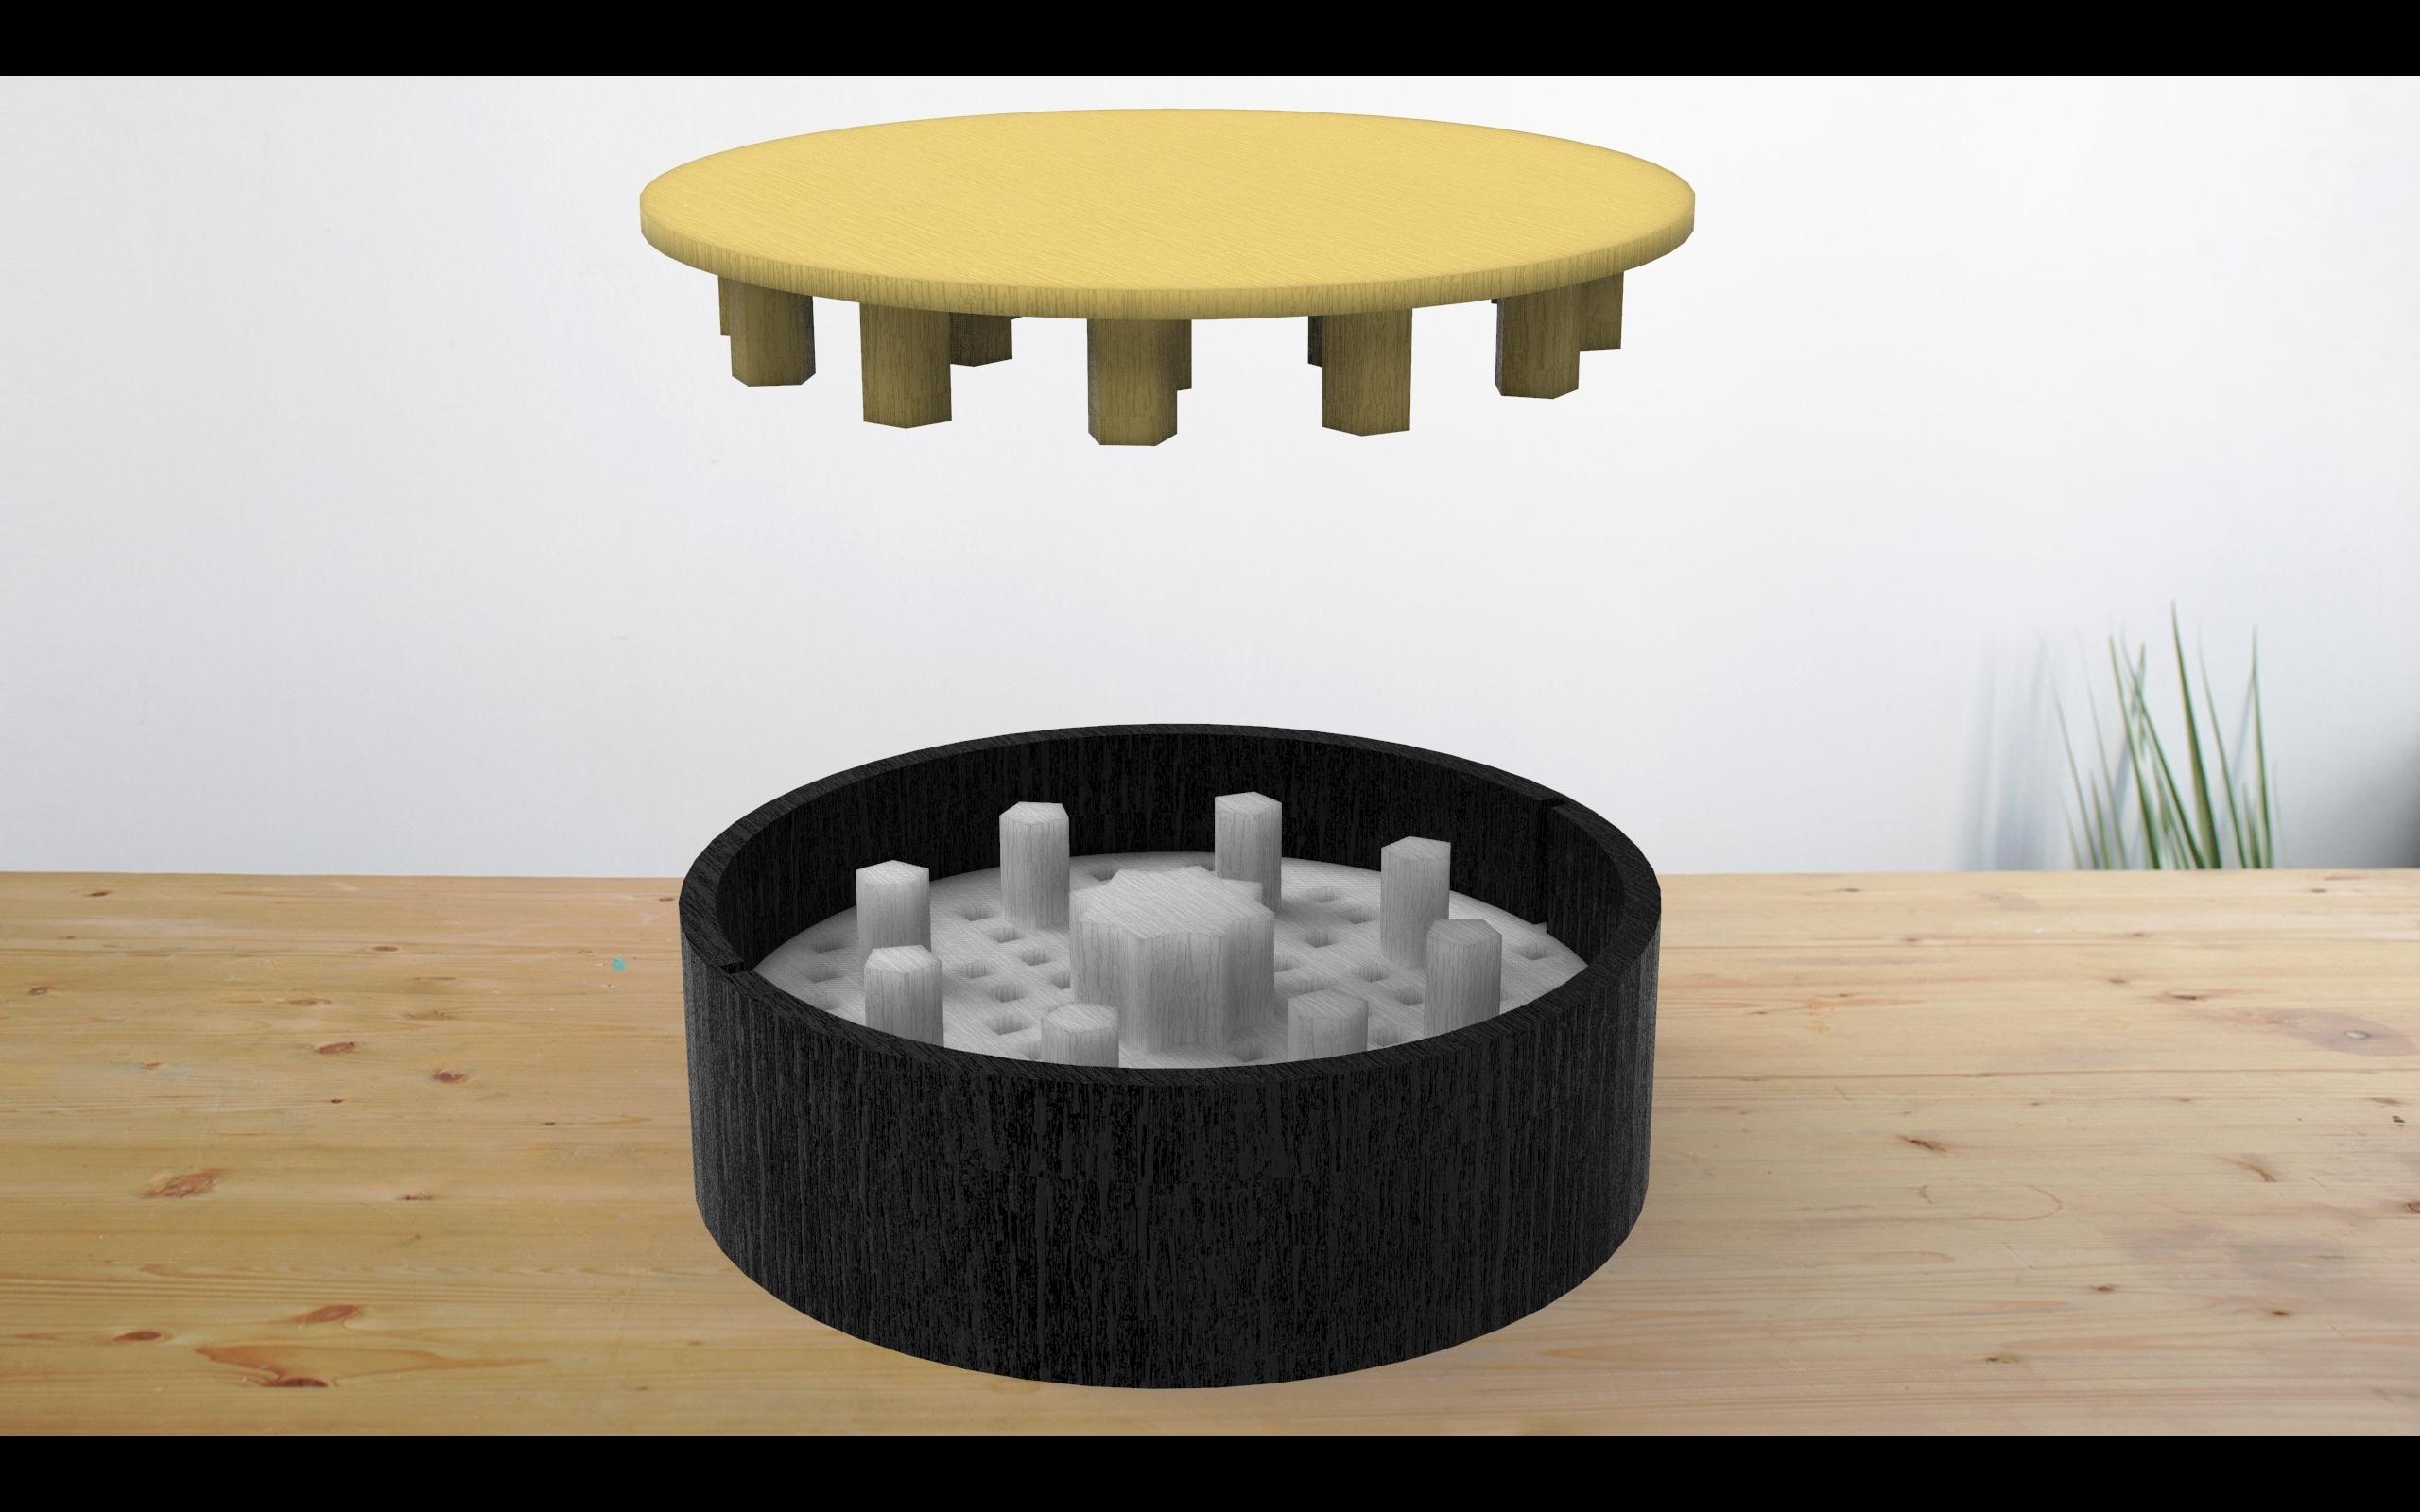 pikachu prueba.jpg Download free STL file Cannabis Crusher with separator • 3D printable design, jhoerchacon_G8